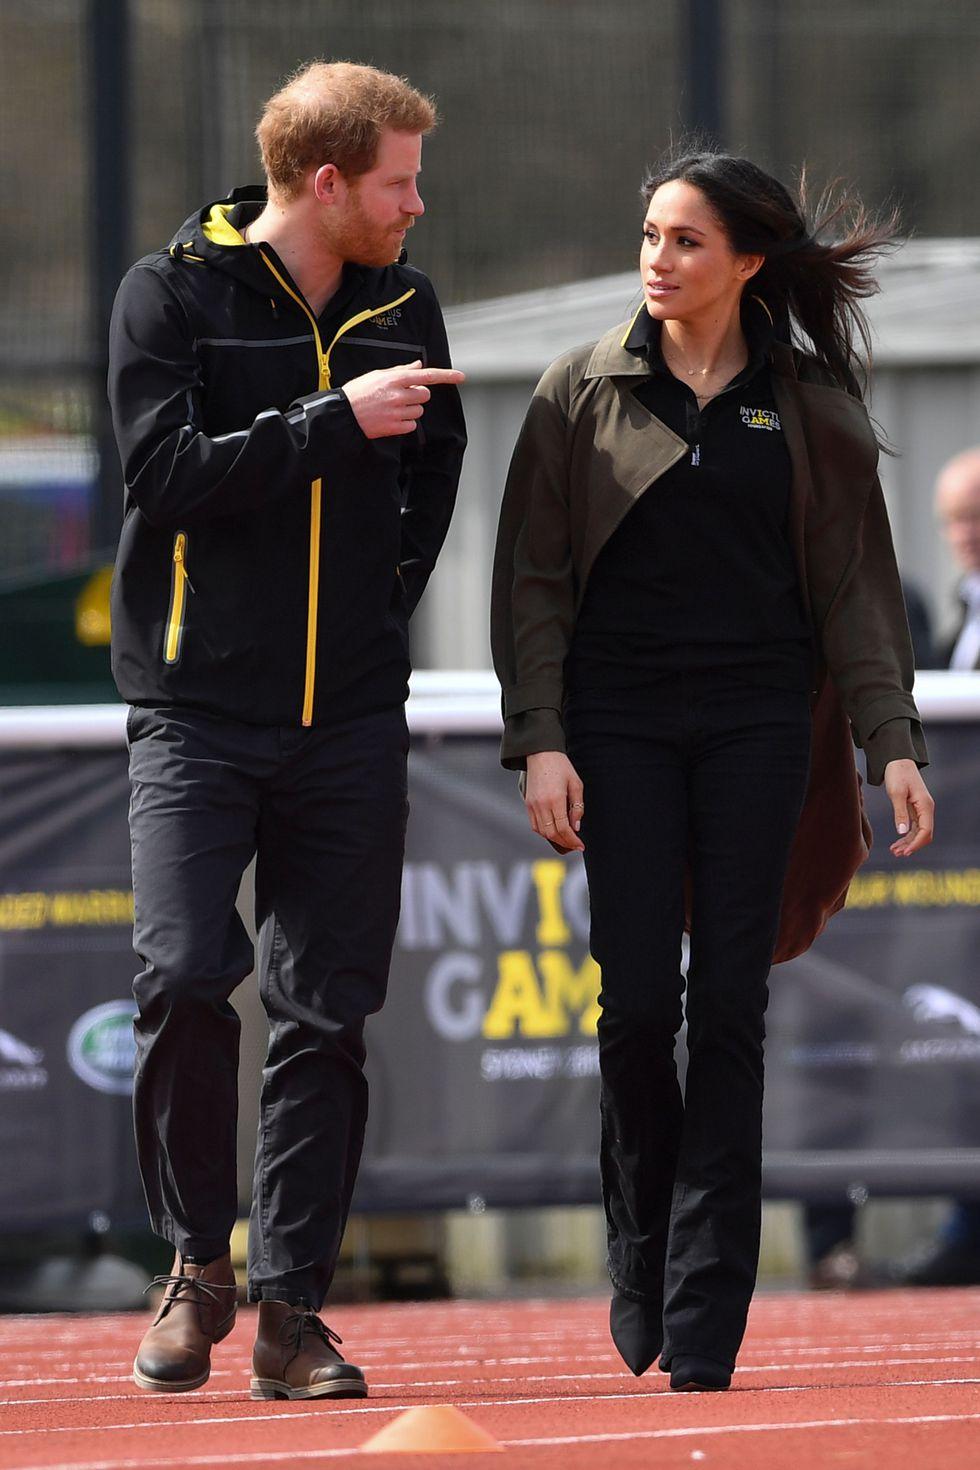 Меган Маркл и принц Гарри на соревнованиях Invictus Games